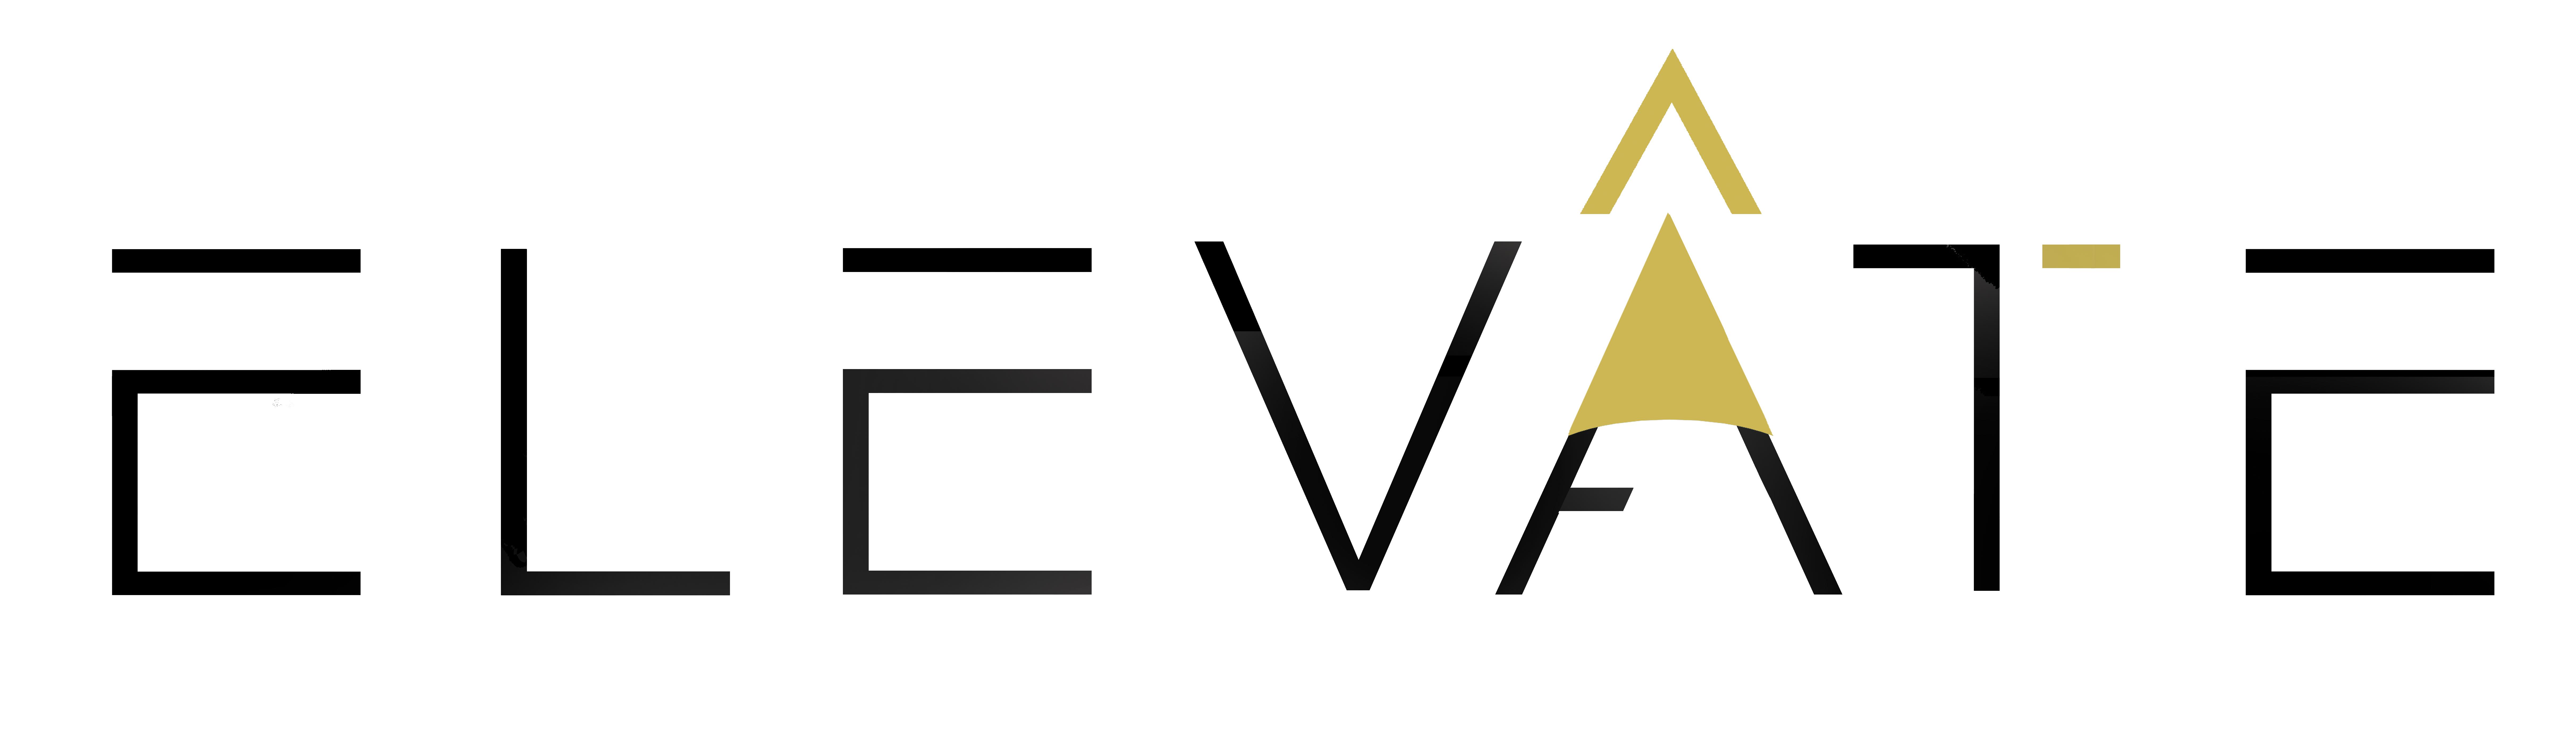 Elevate XP